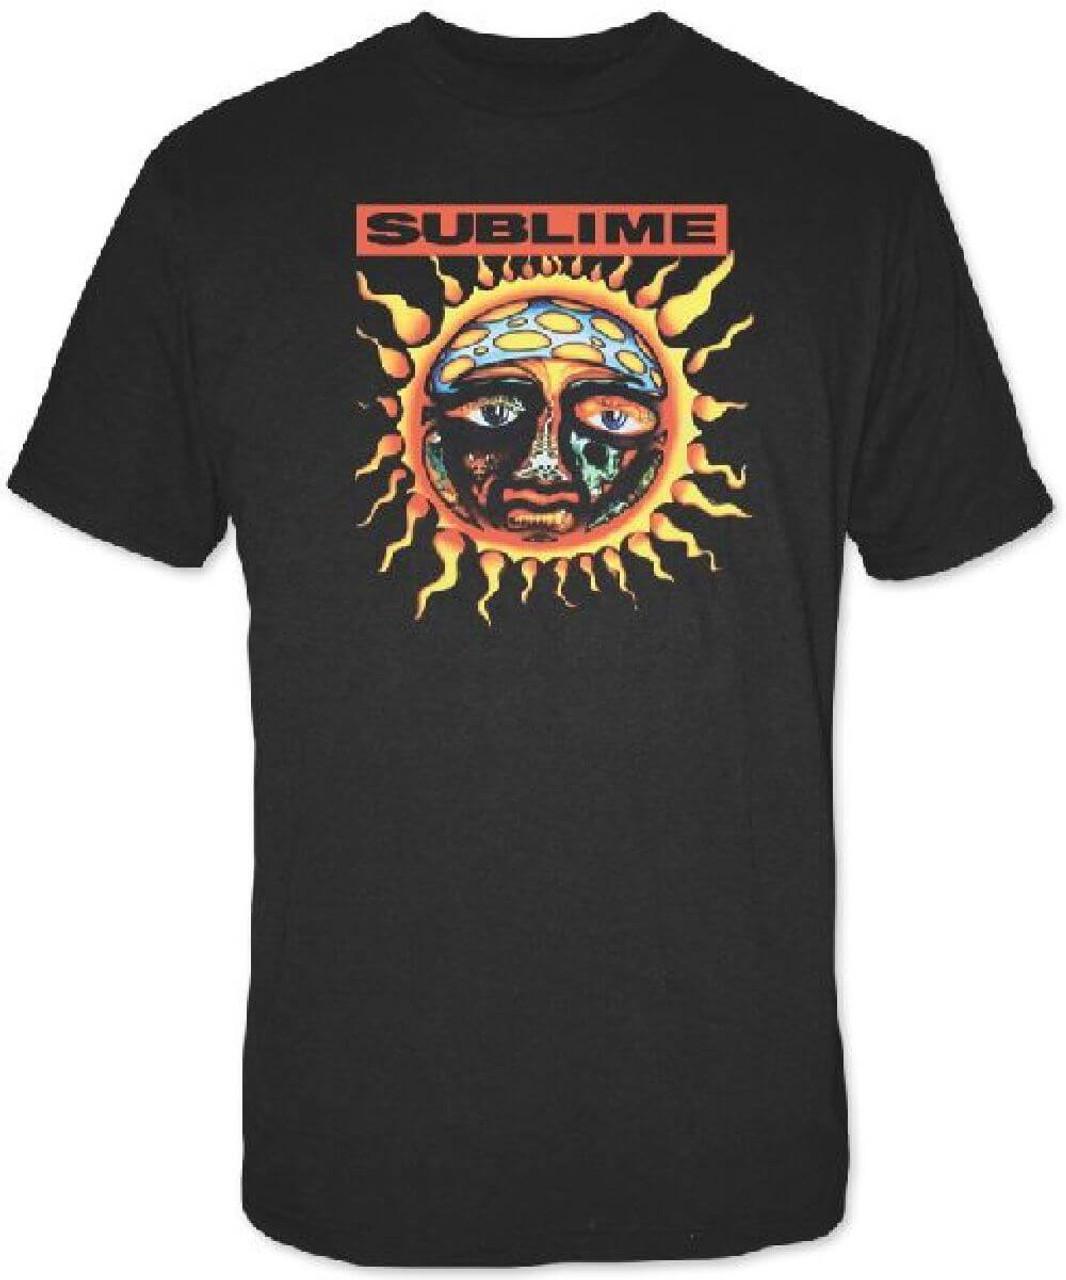 Sublime T-shirt - Sun Logo from 40 Oz  to Freedom Album Cover  Men's Black